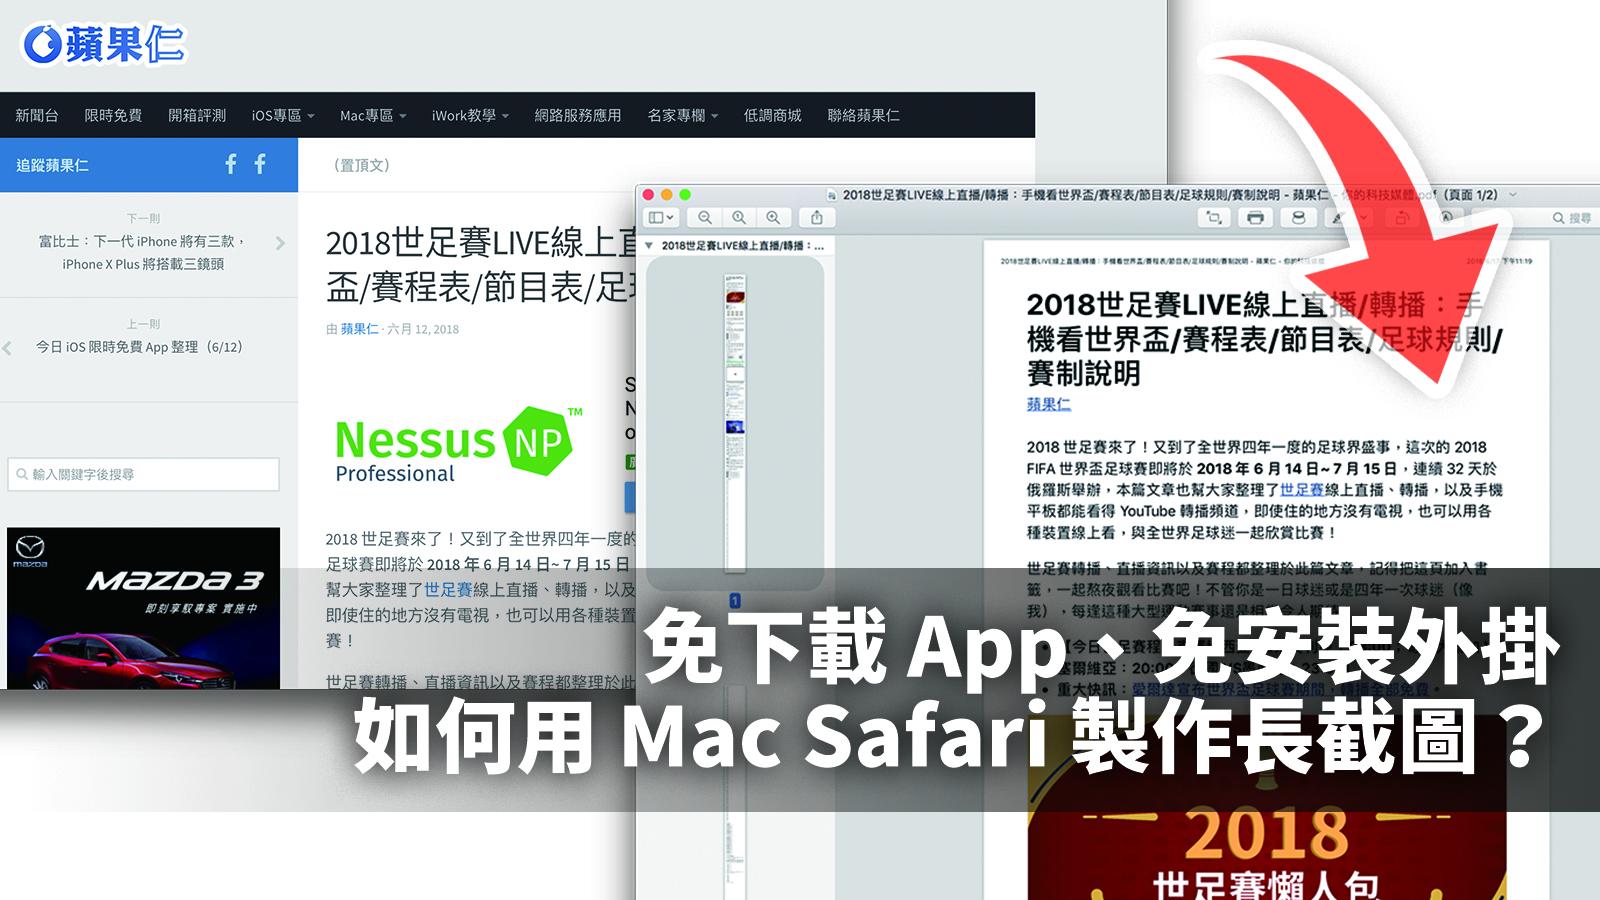 mac Safari 螢幕截圖 外掛